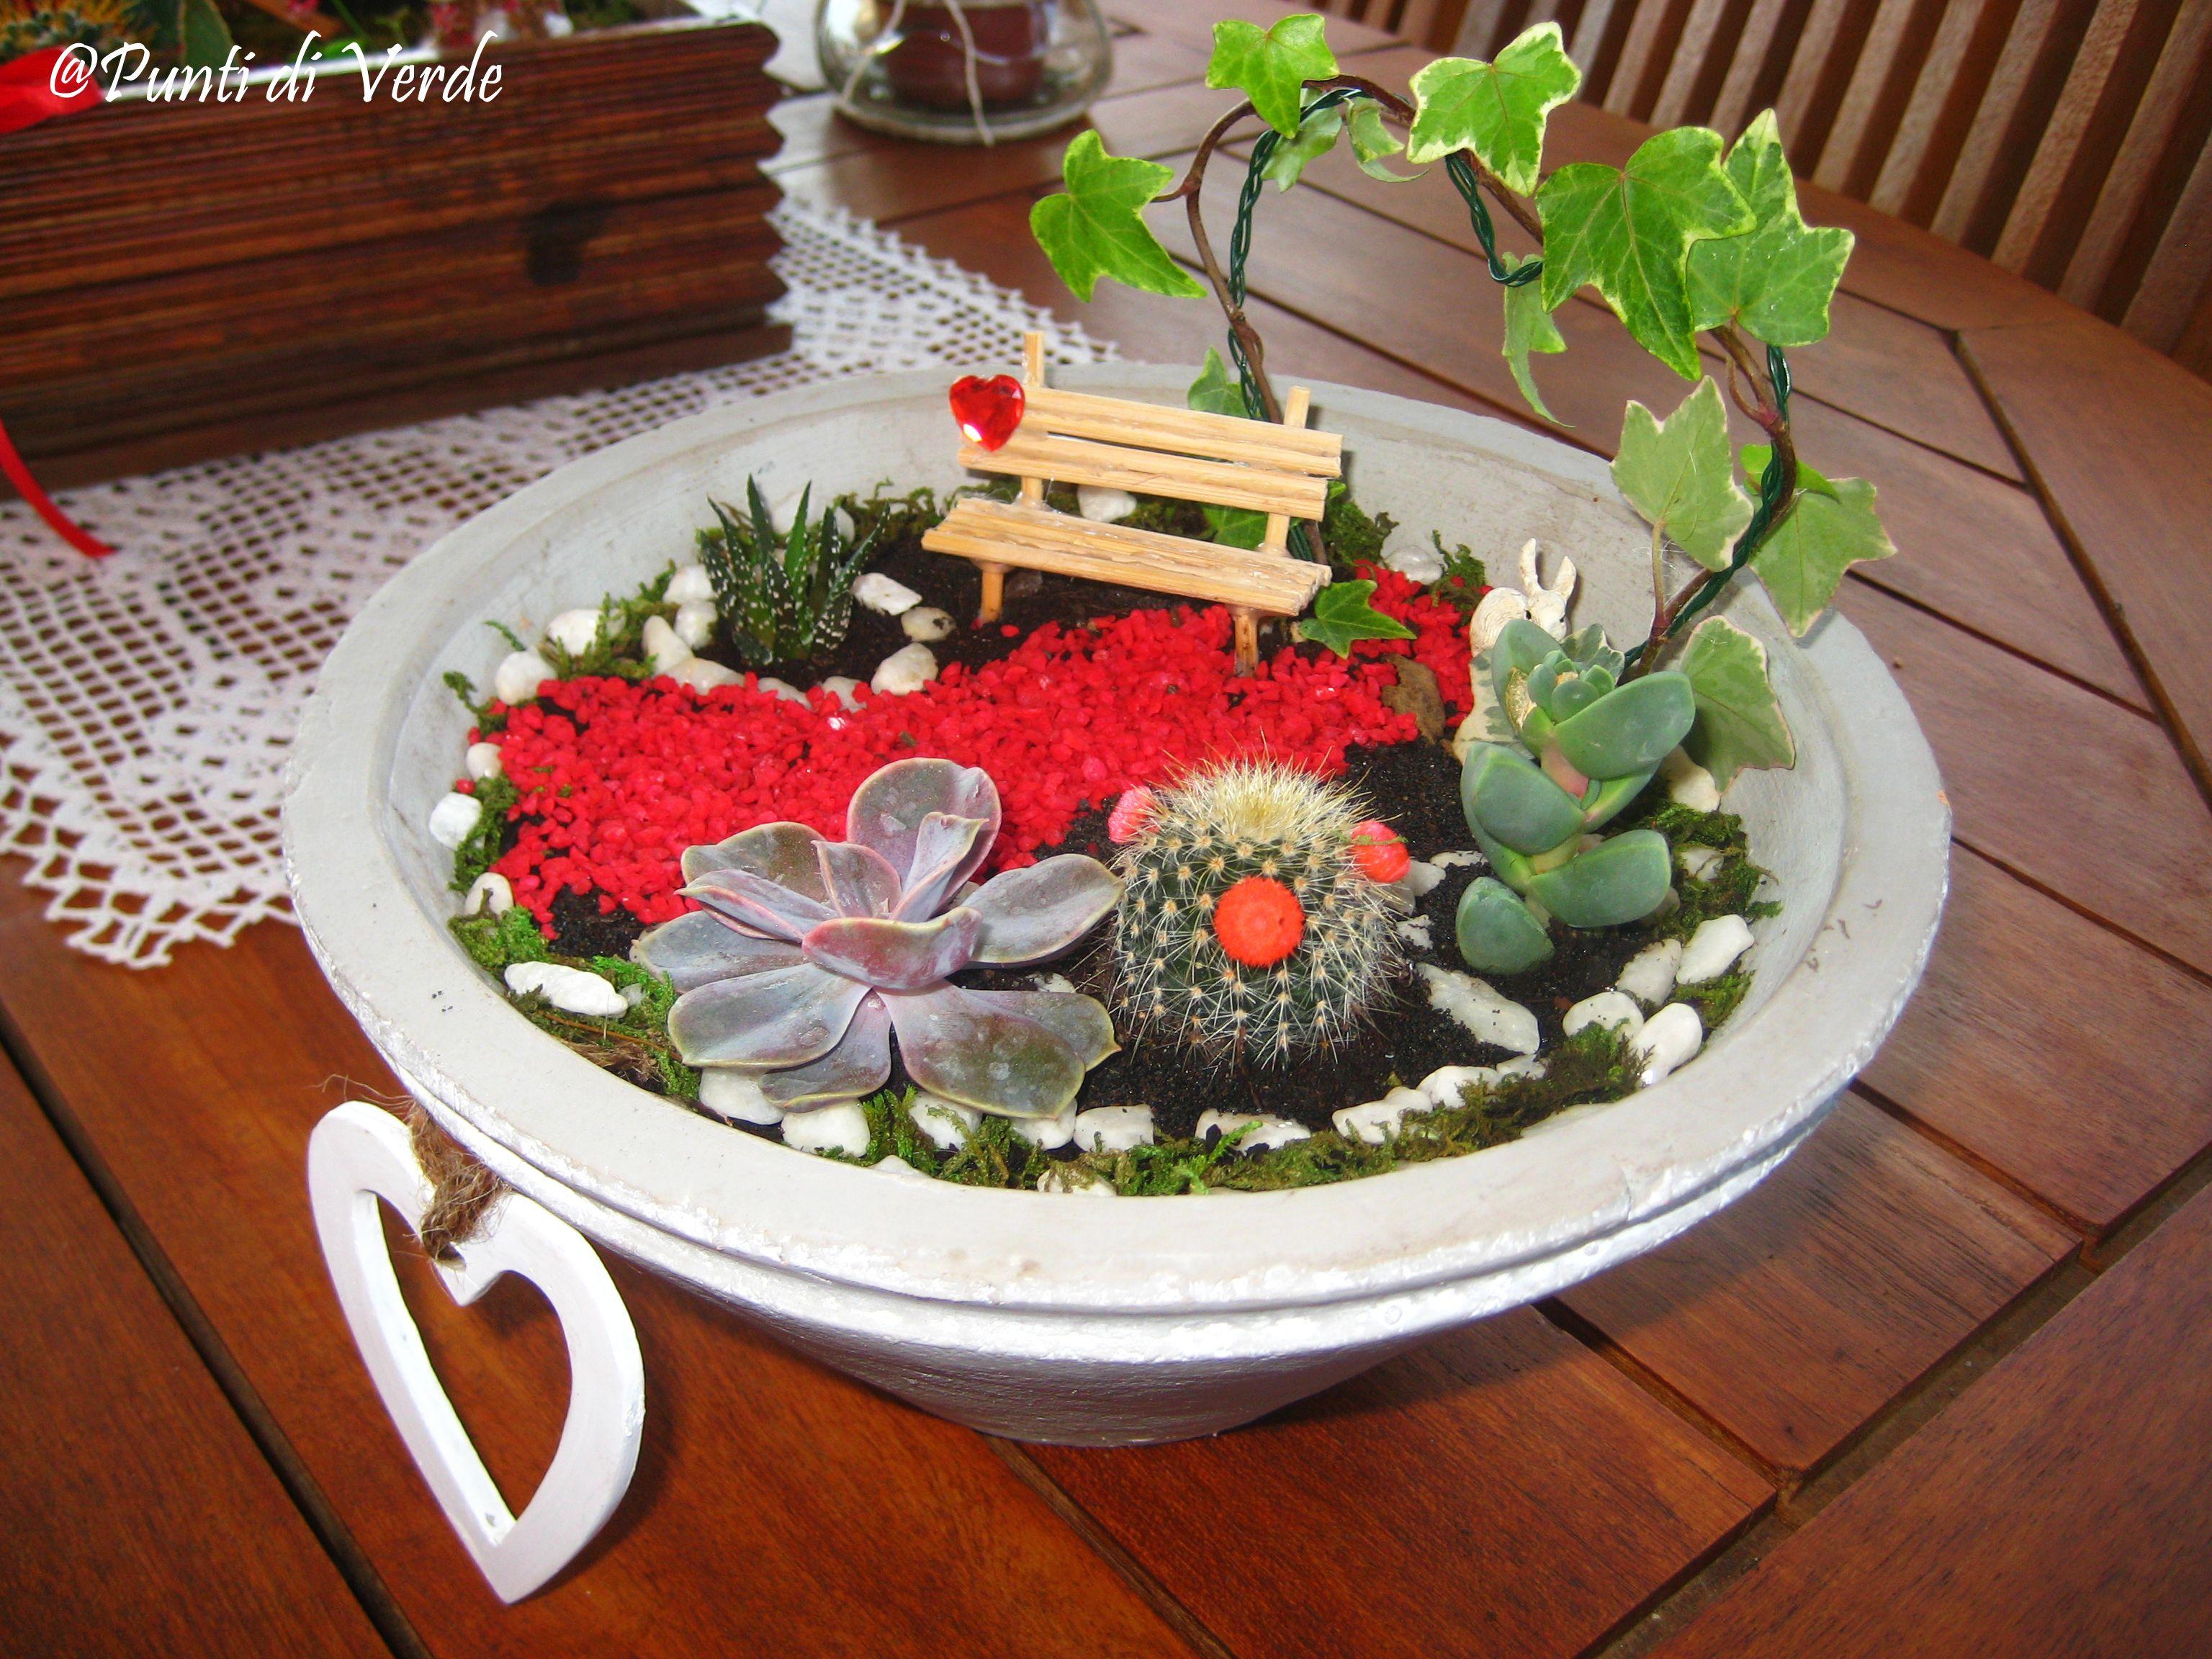 Giardino in miniatura con panchina terrario giardini in miniatura pinterest panchina - Giardino in miniatura ...